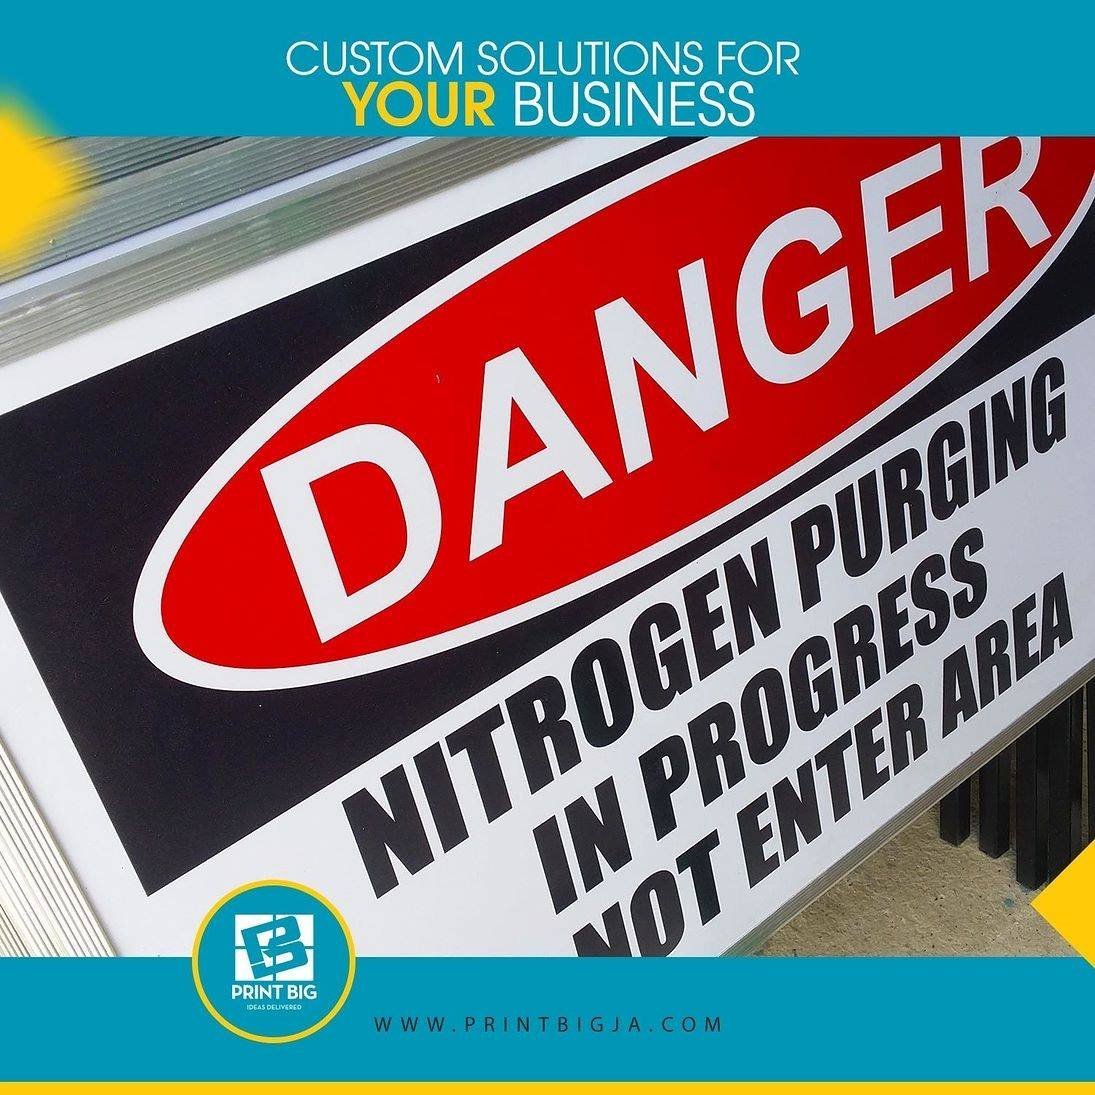 Regulatory signs warn of dangers provide